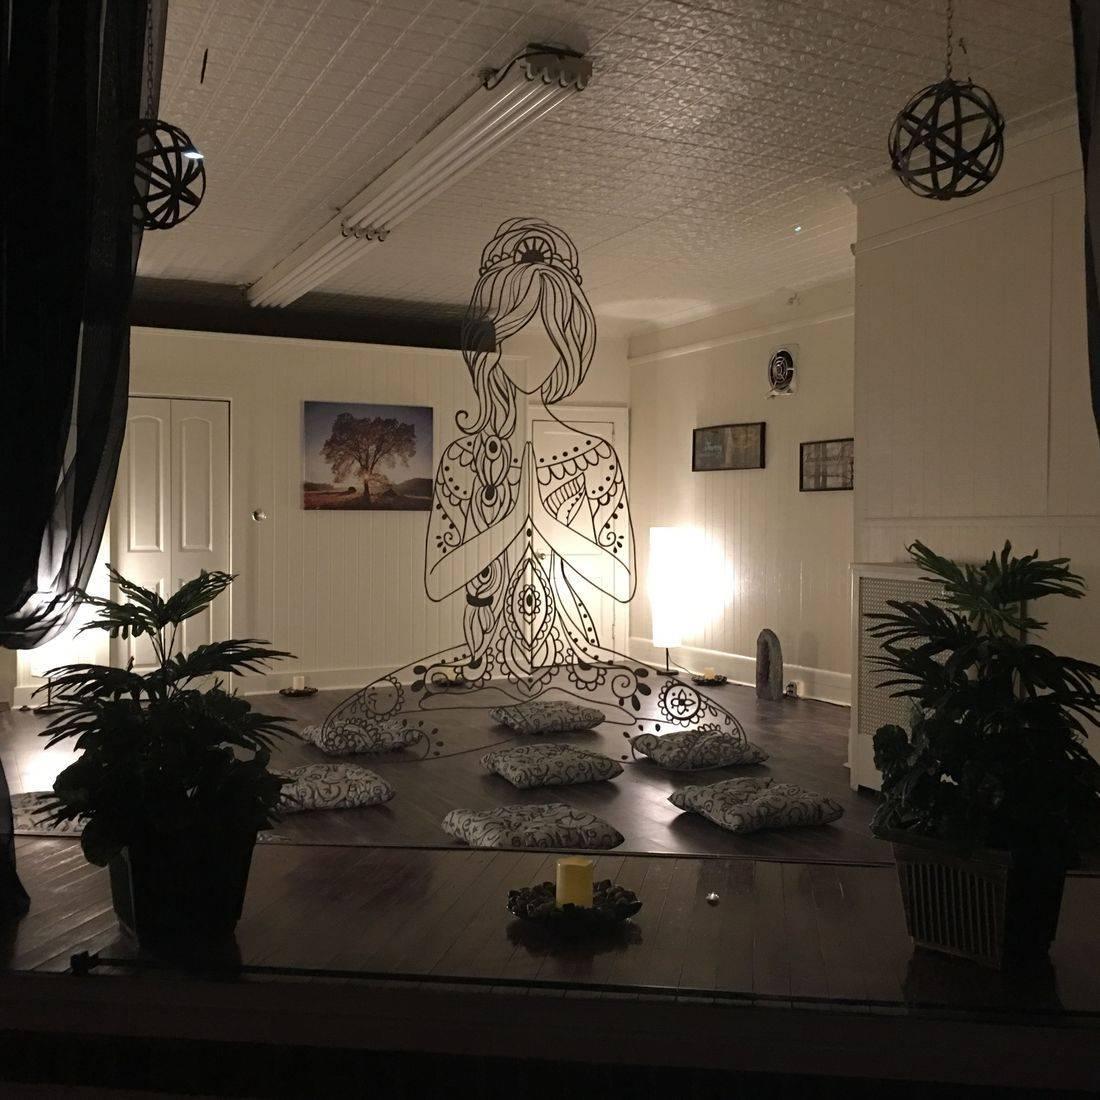 earth's healings, meditation, group meditation, metaphysical shop, new age, crystals, smudges, yoga, reiki, energy healing,  river edge nj